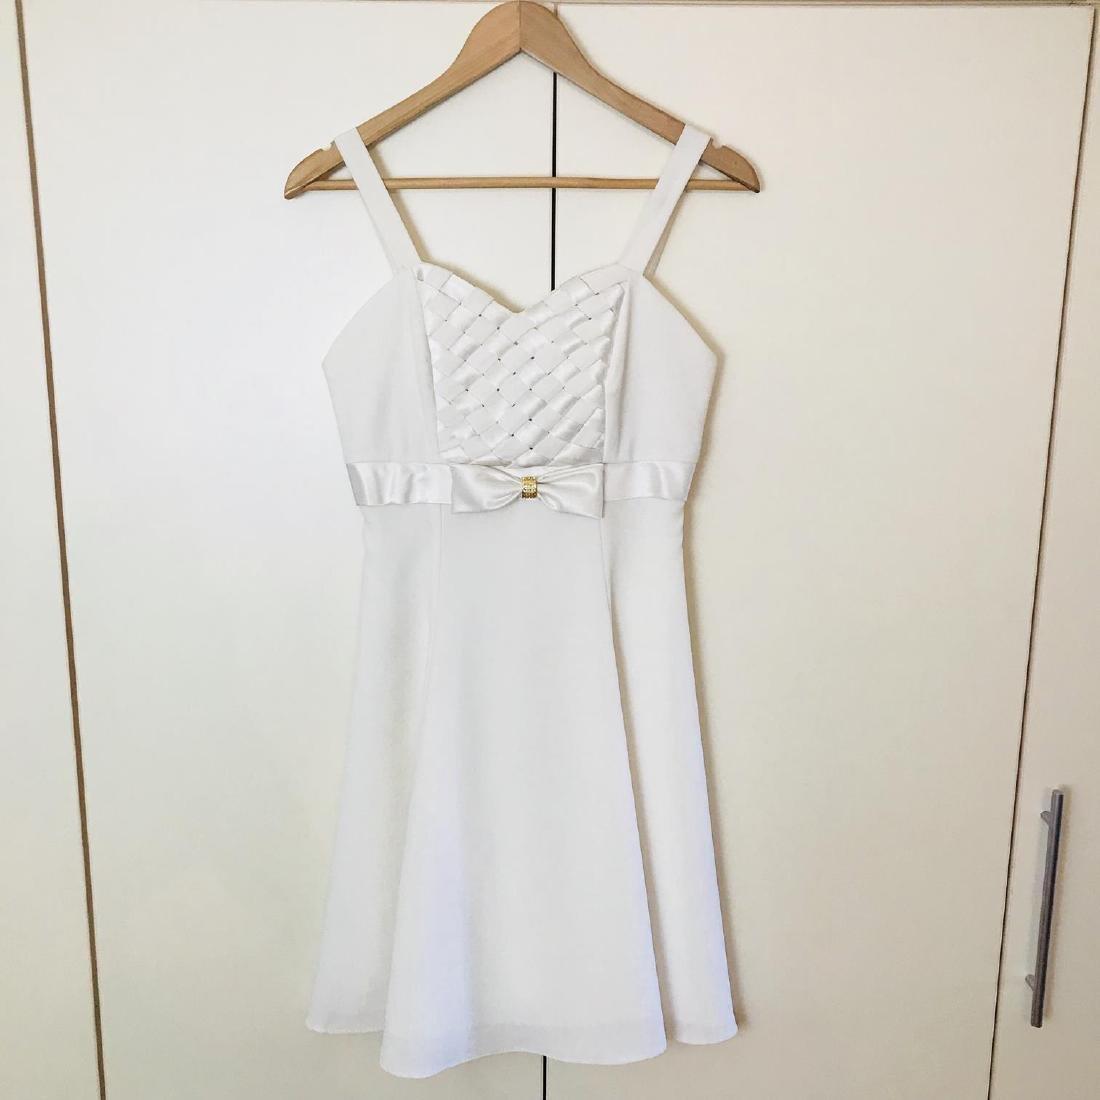 Vintage Women's White Designer Dress Size US 8 EUR 38 - 2